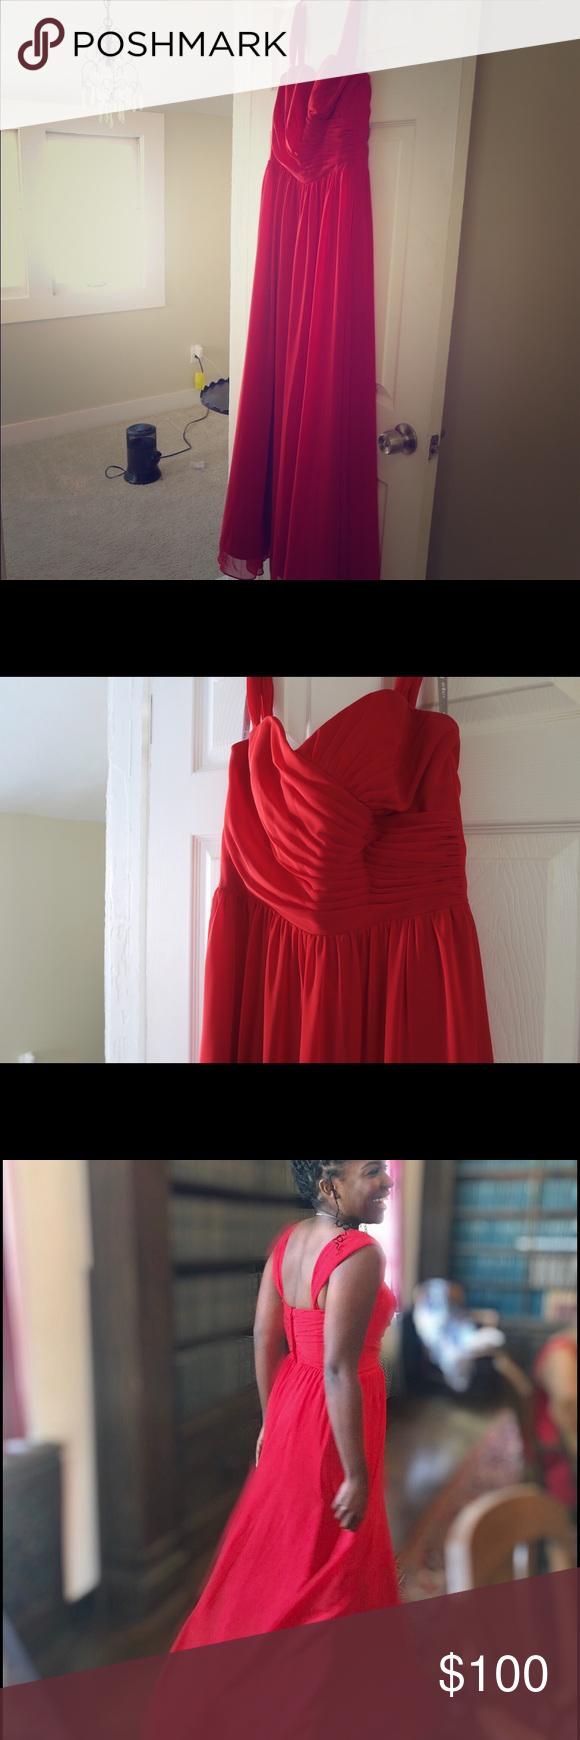 Red floor length chiffon dress red floor cherries and beautiful